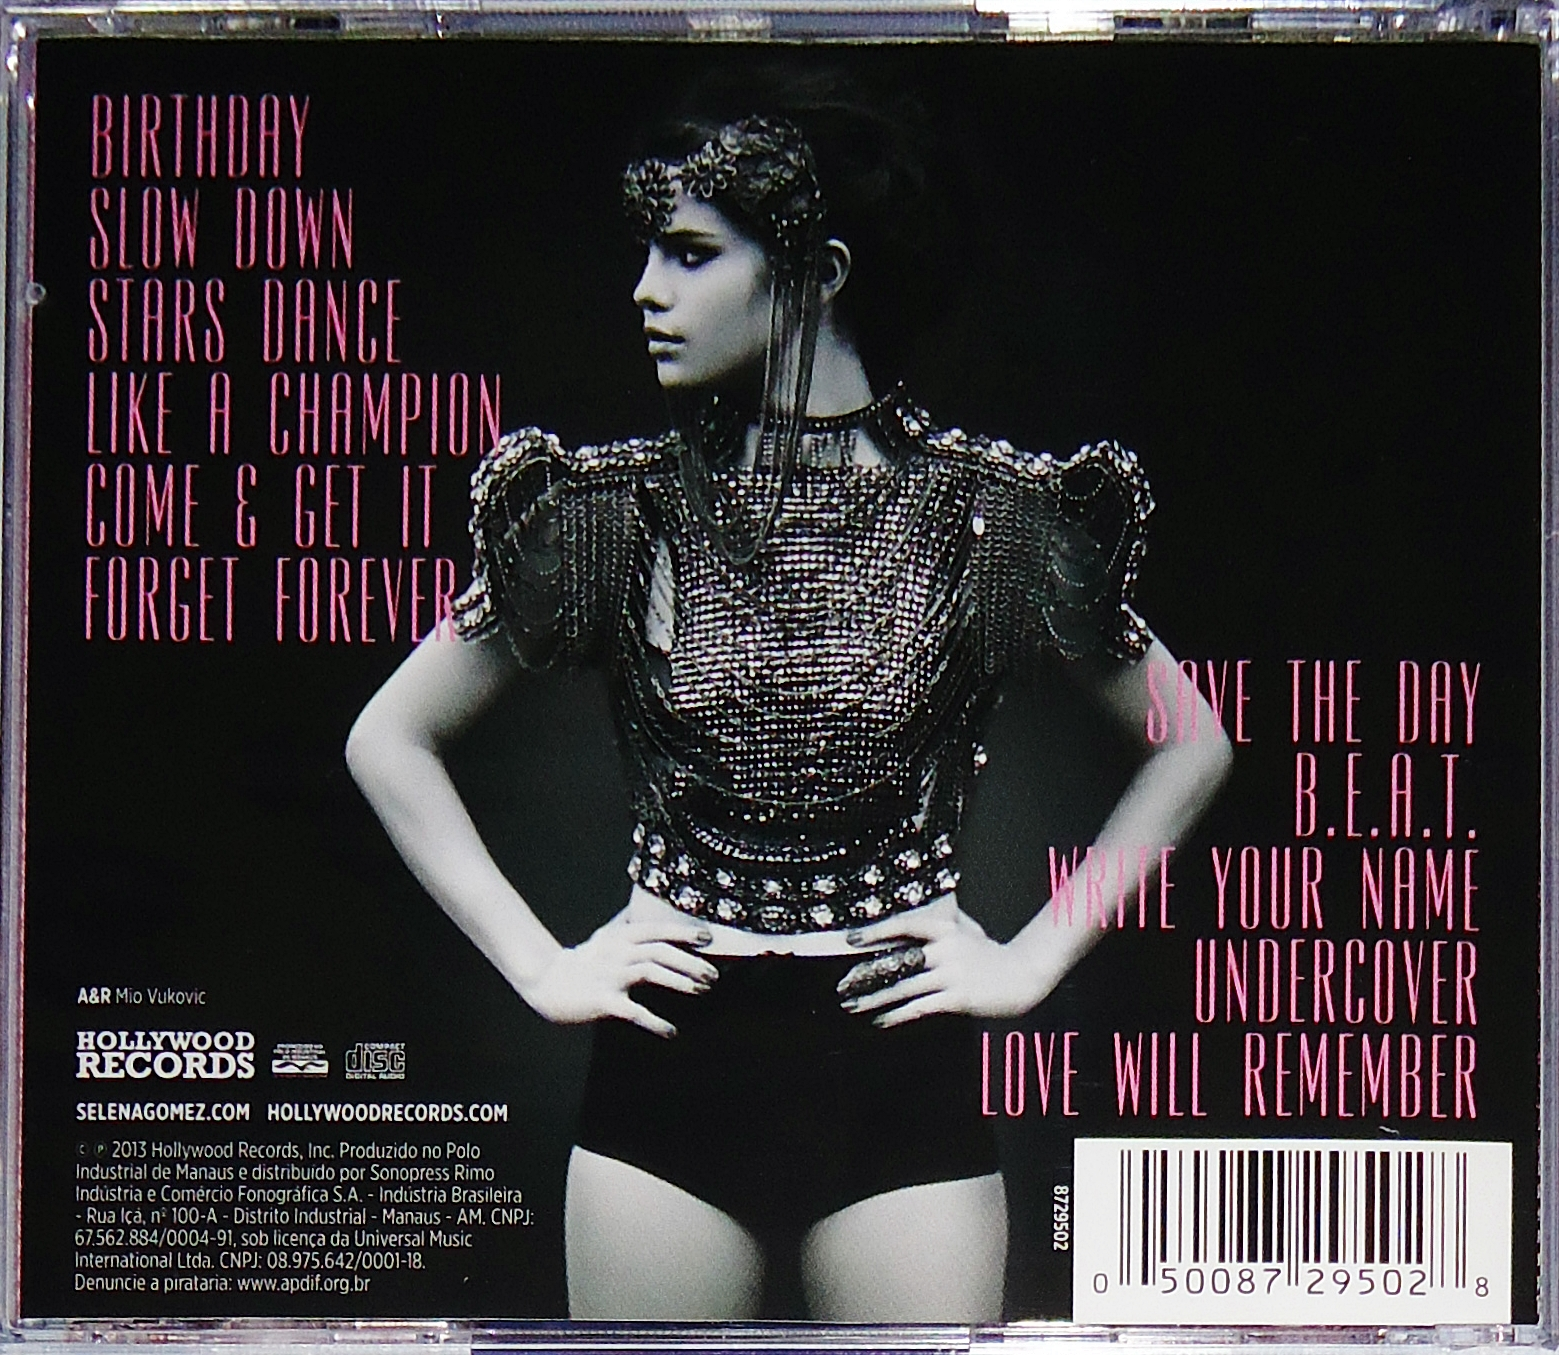 Stars Dance Selena Gomez Mp3 Download - MusicPleer